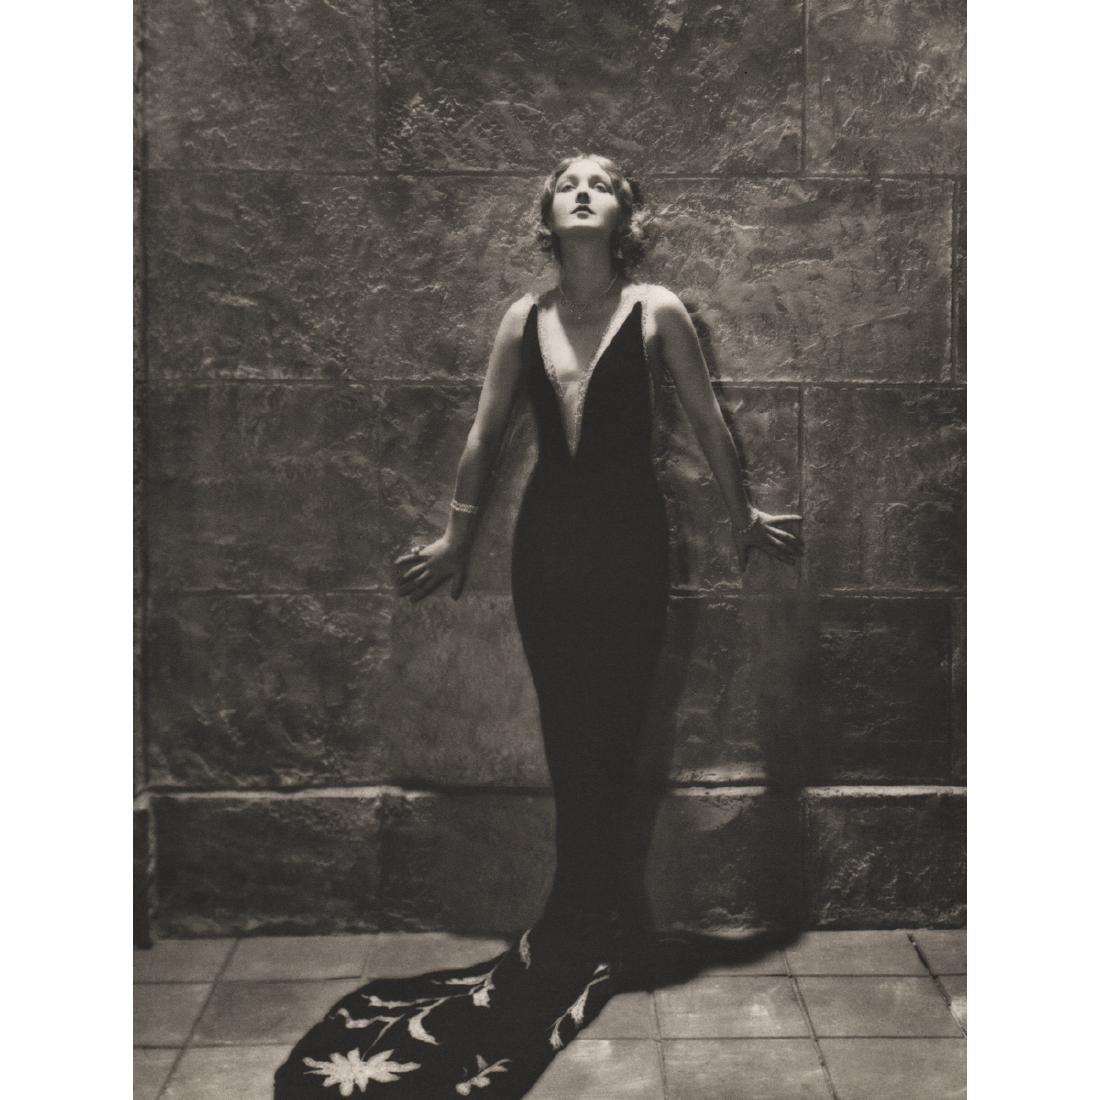 Unknown - Vilma Banky, 1927